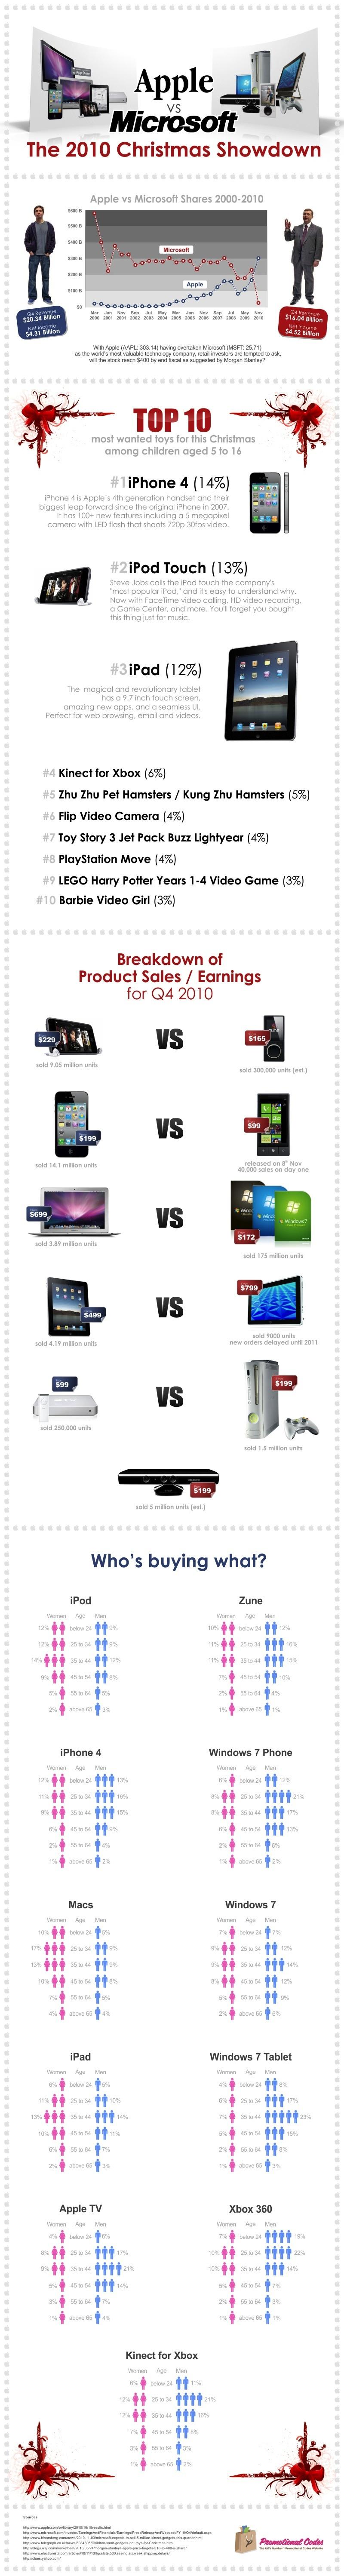 Apple vs Microsoft 2010 Christmas Sales Showdown